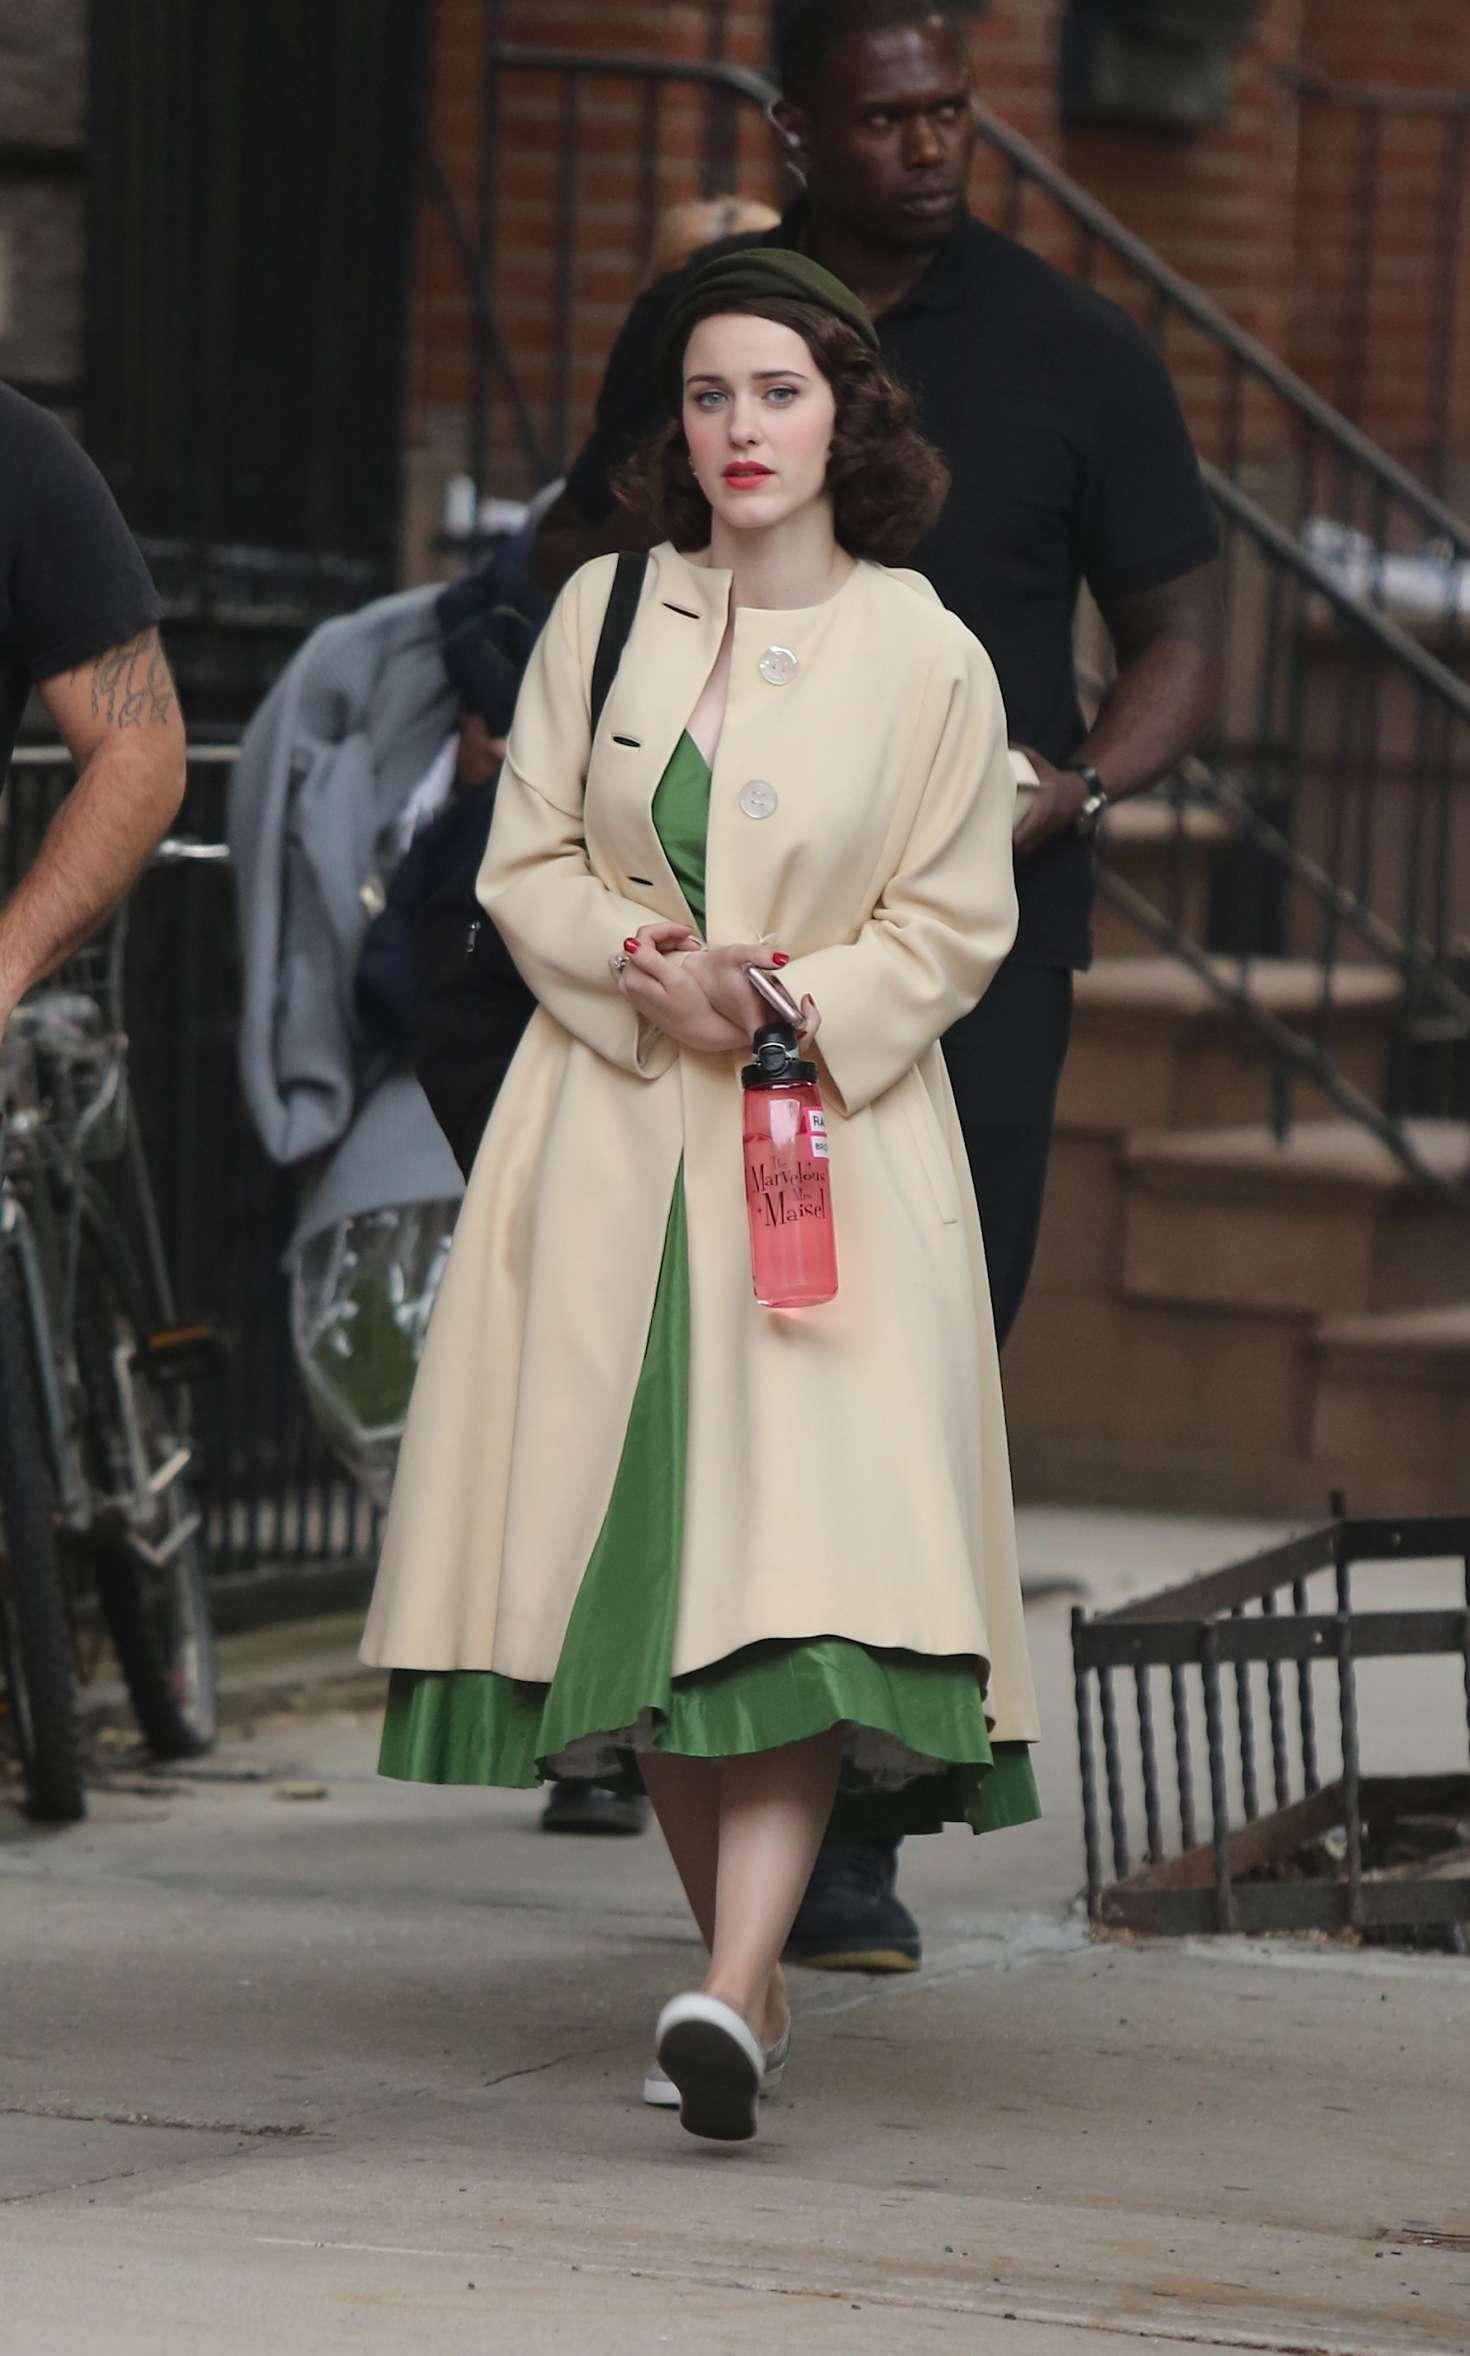 Rachel Brosnahan on the set of 'The Marvelous Mrs. Maisel' in NY